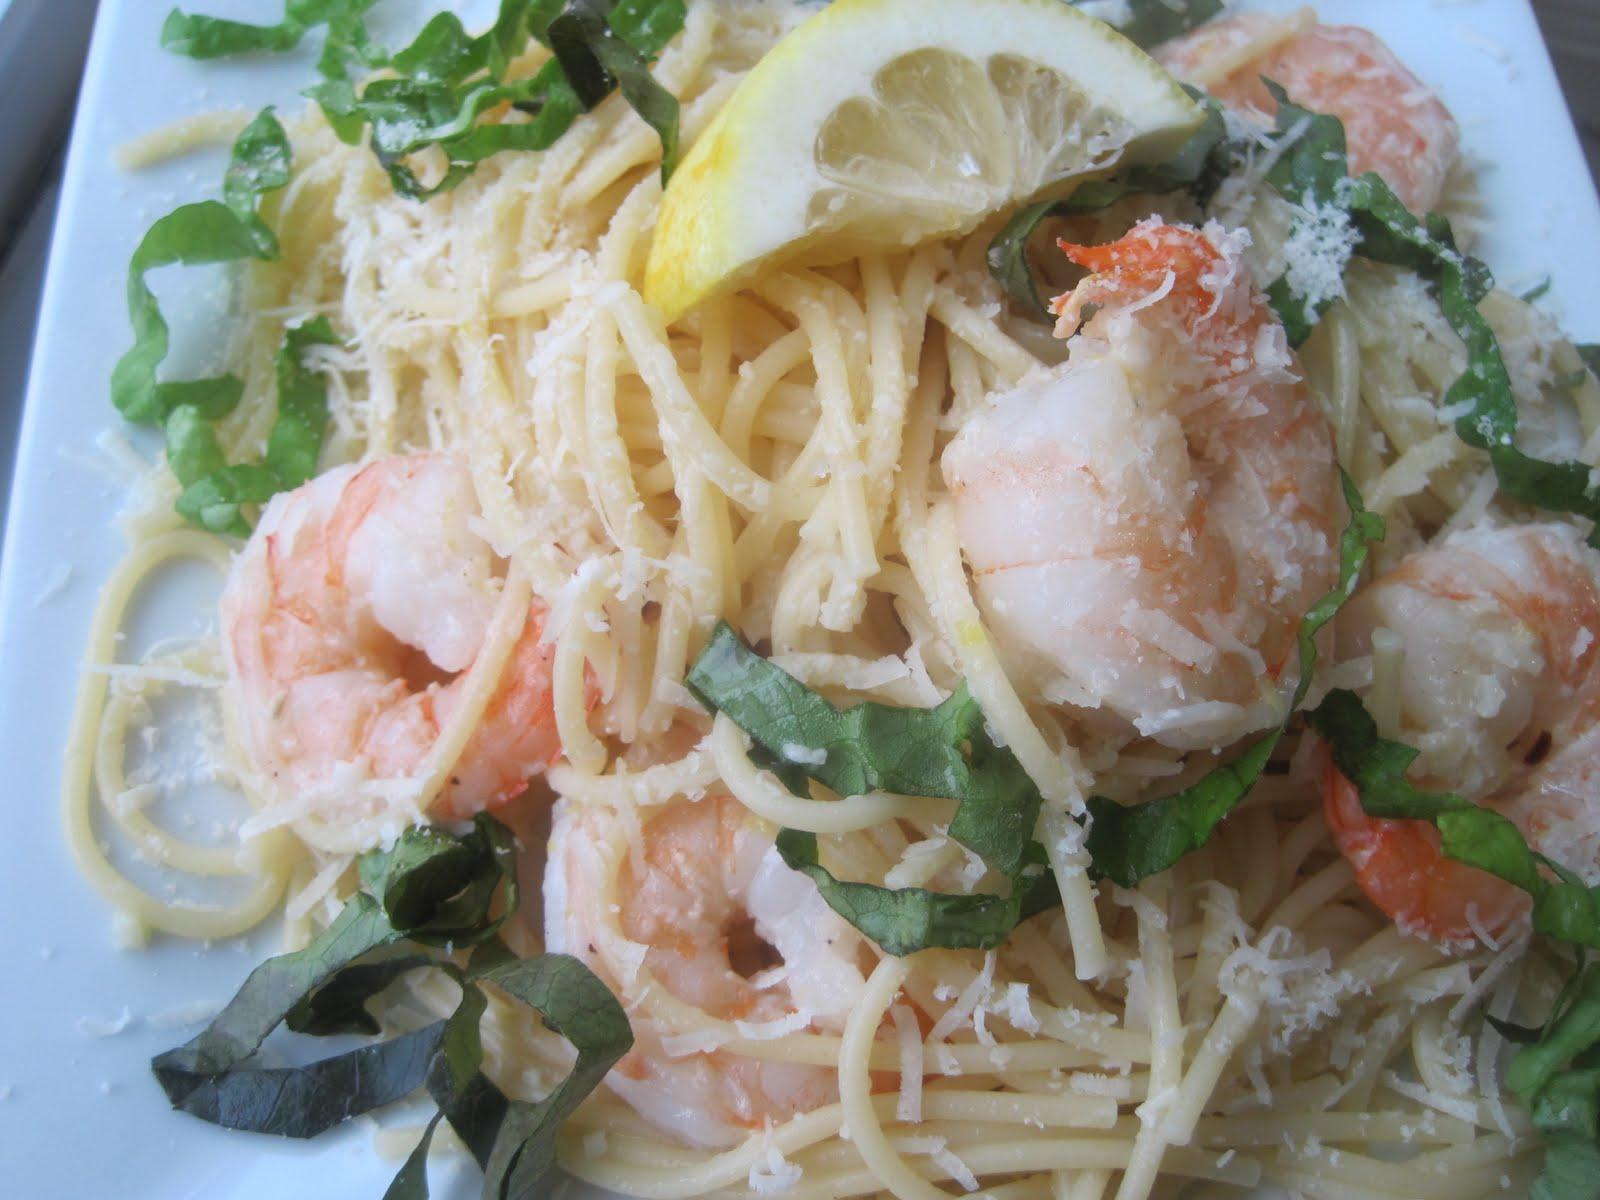 Ina Garten Shrimp Linguine Taste The Rainbow Shrimp Scampi Over Linguine Adapted